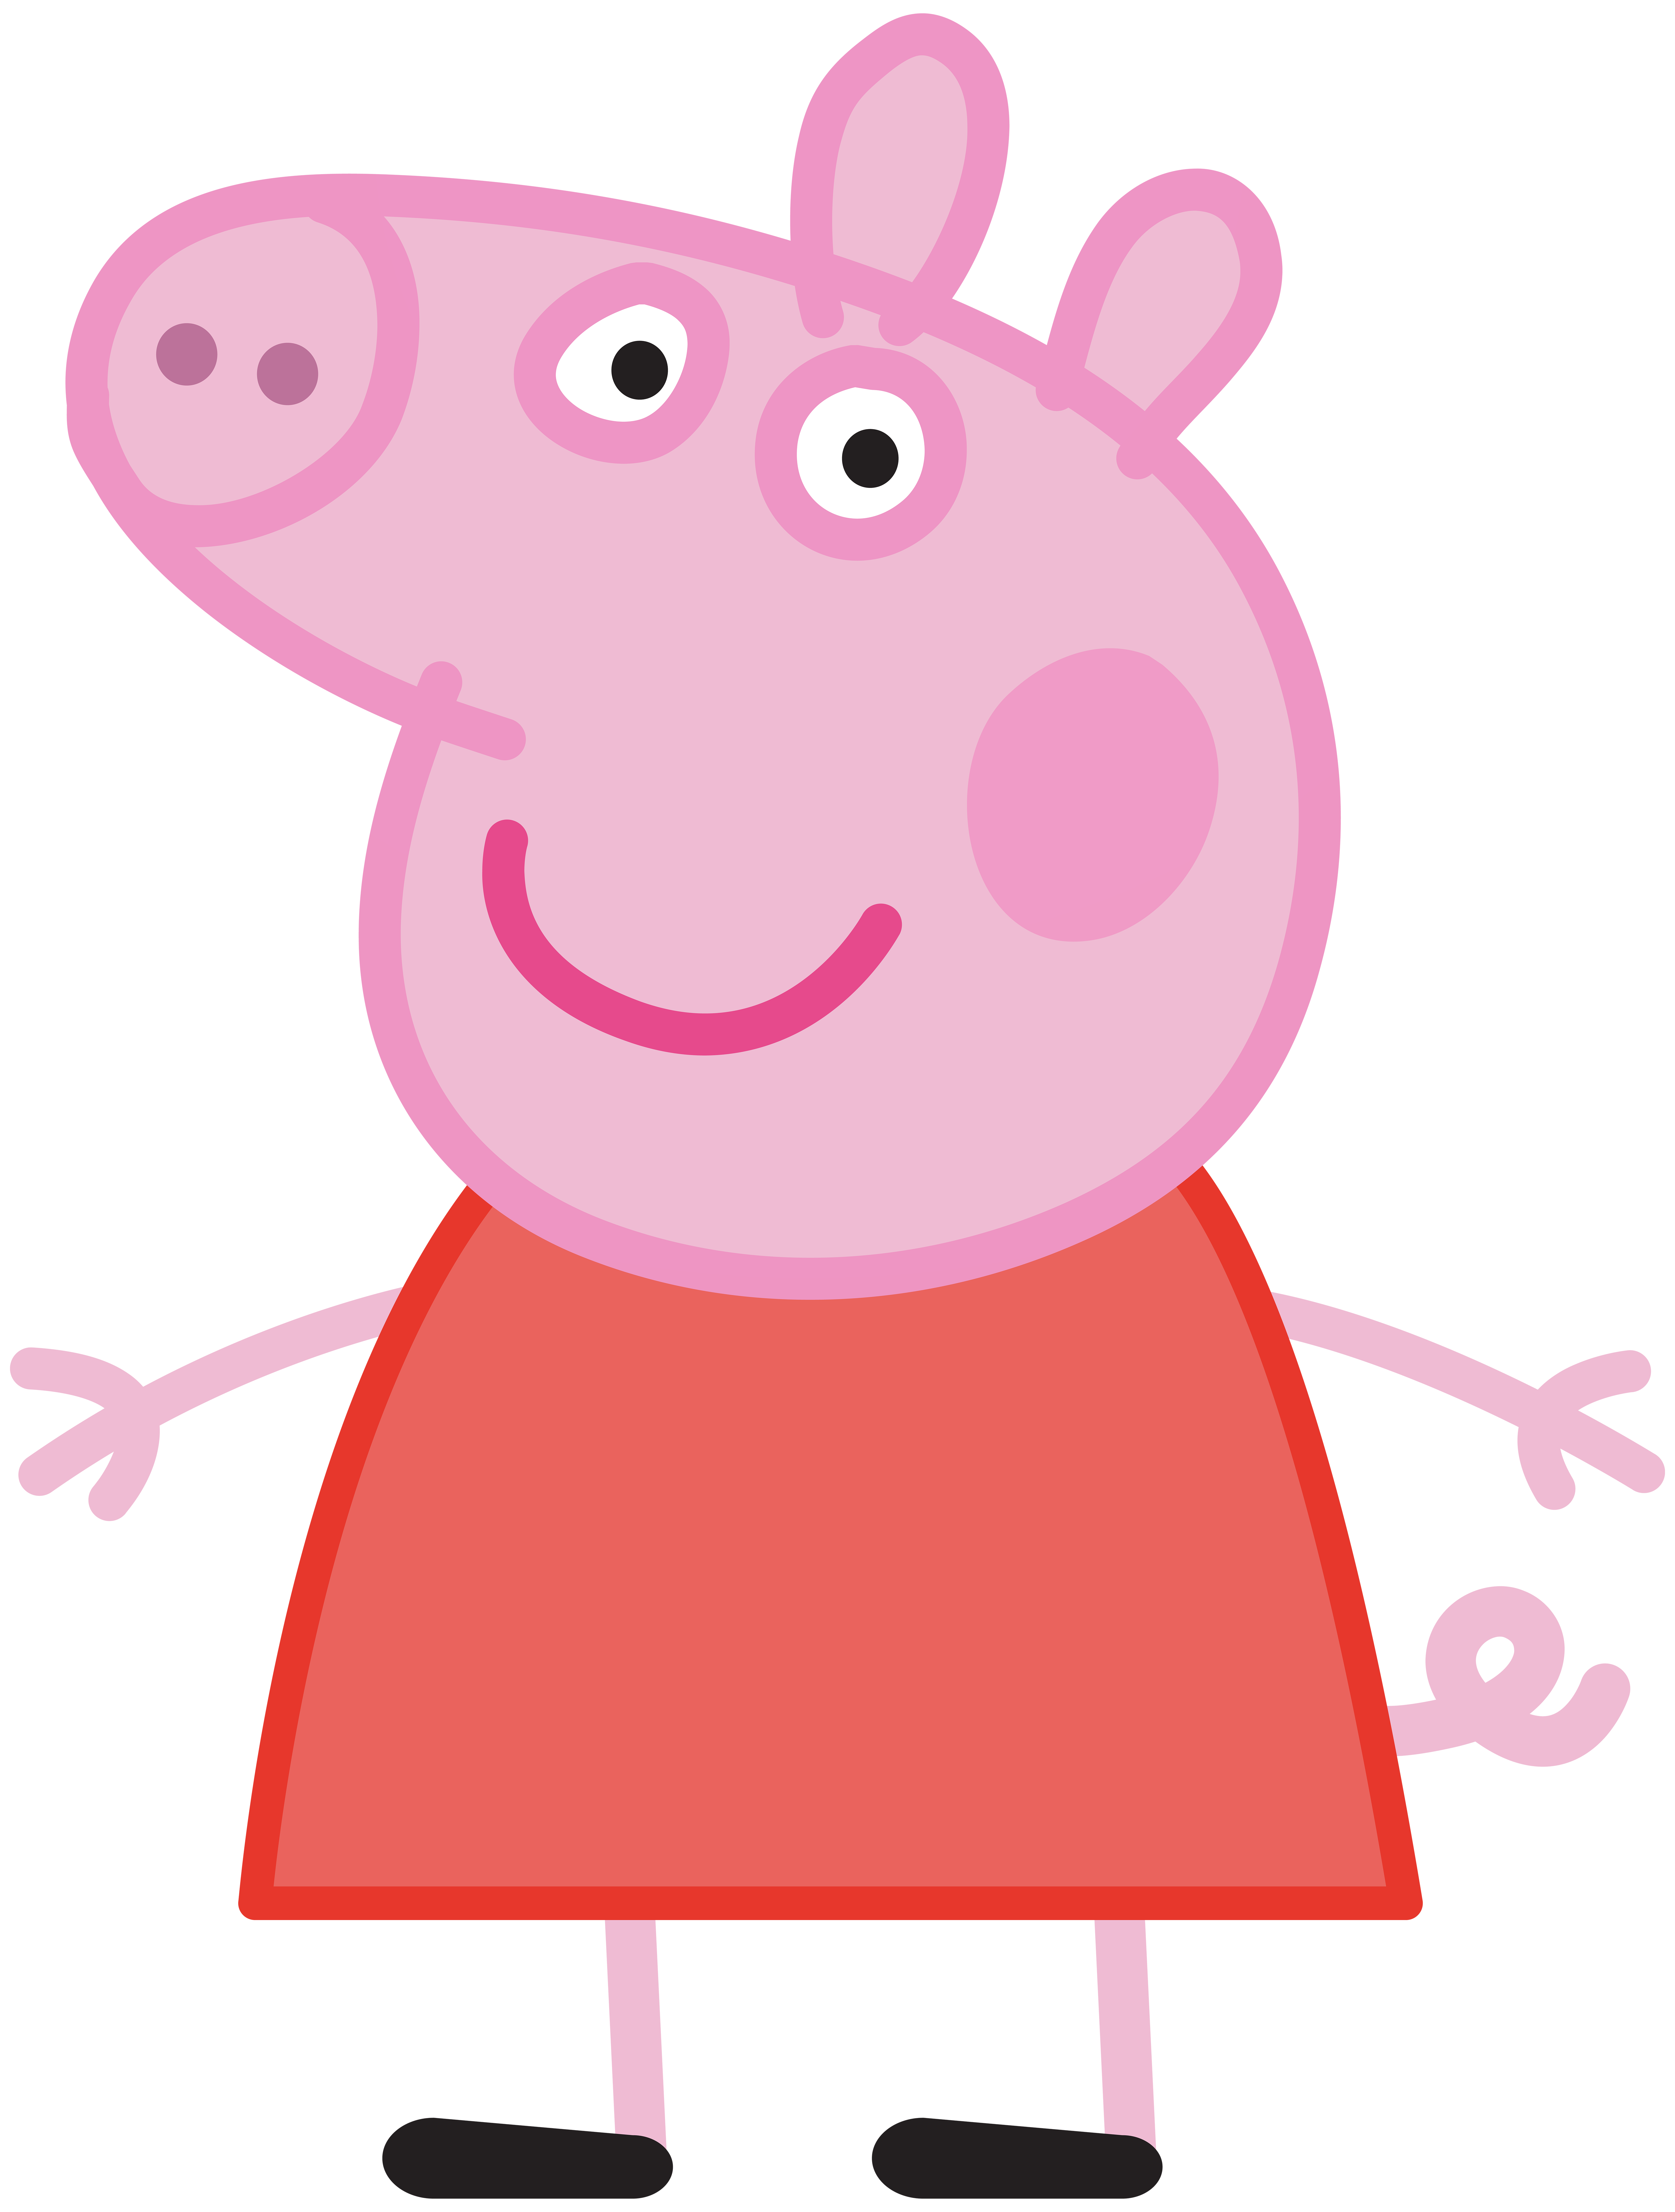 Peppa Pig Transparent Png Image Peppa Pig Pictures Peppa Pig Wallpaper Peppa Pig Images [ 8000 x 6057 Pixel ]